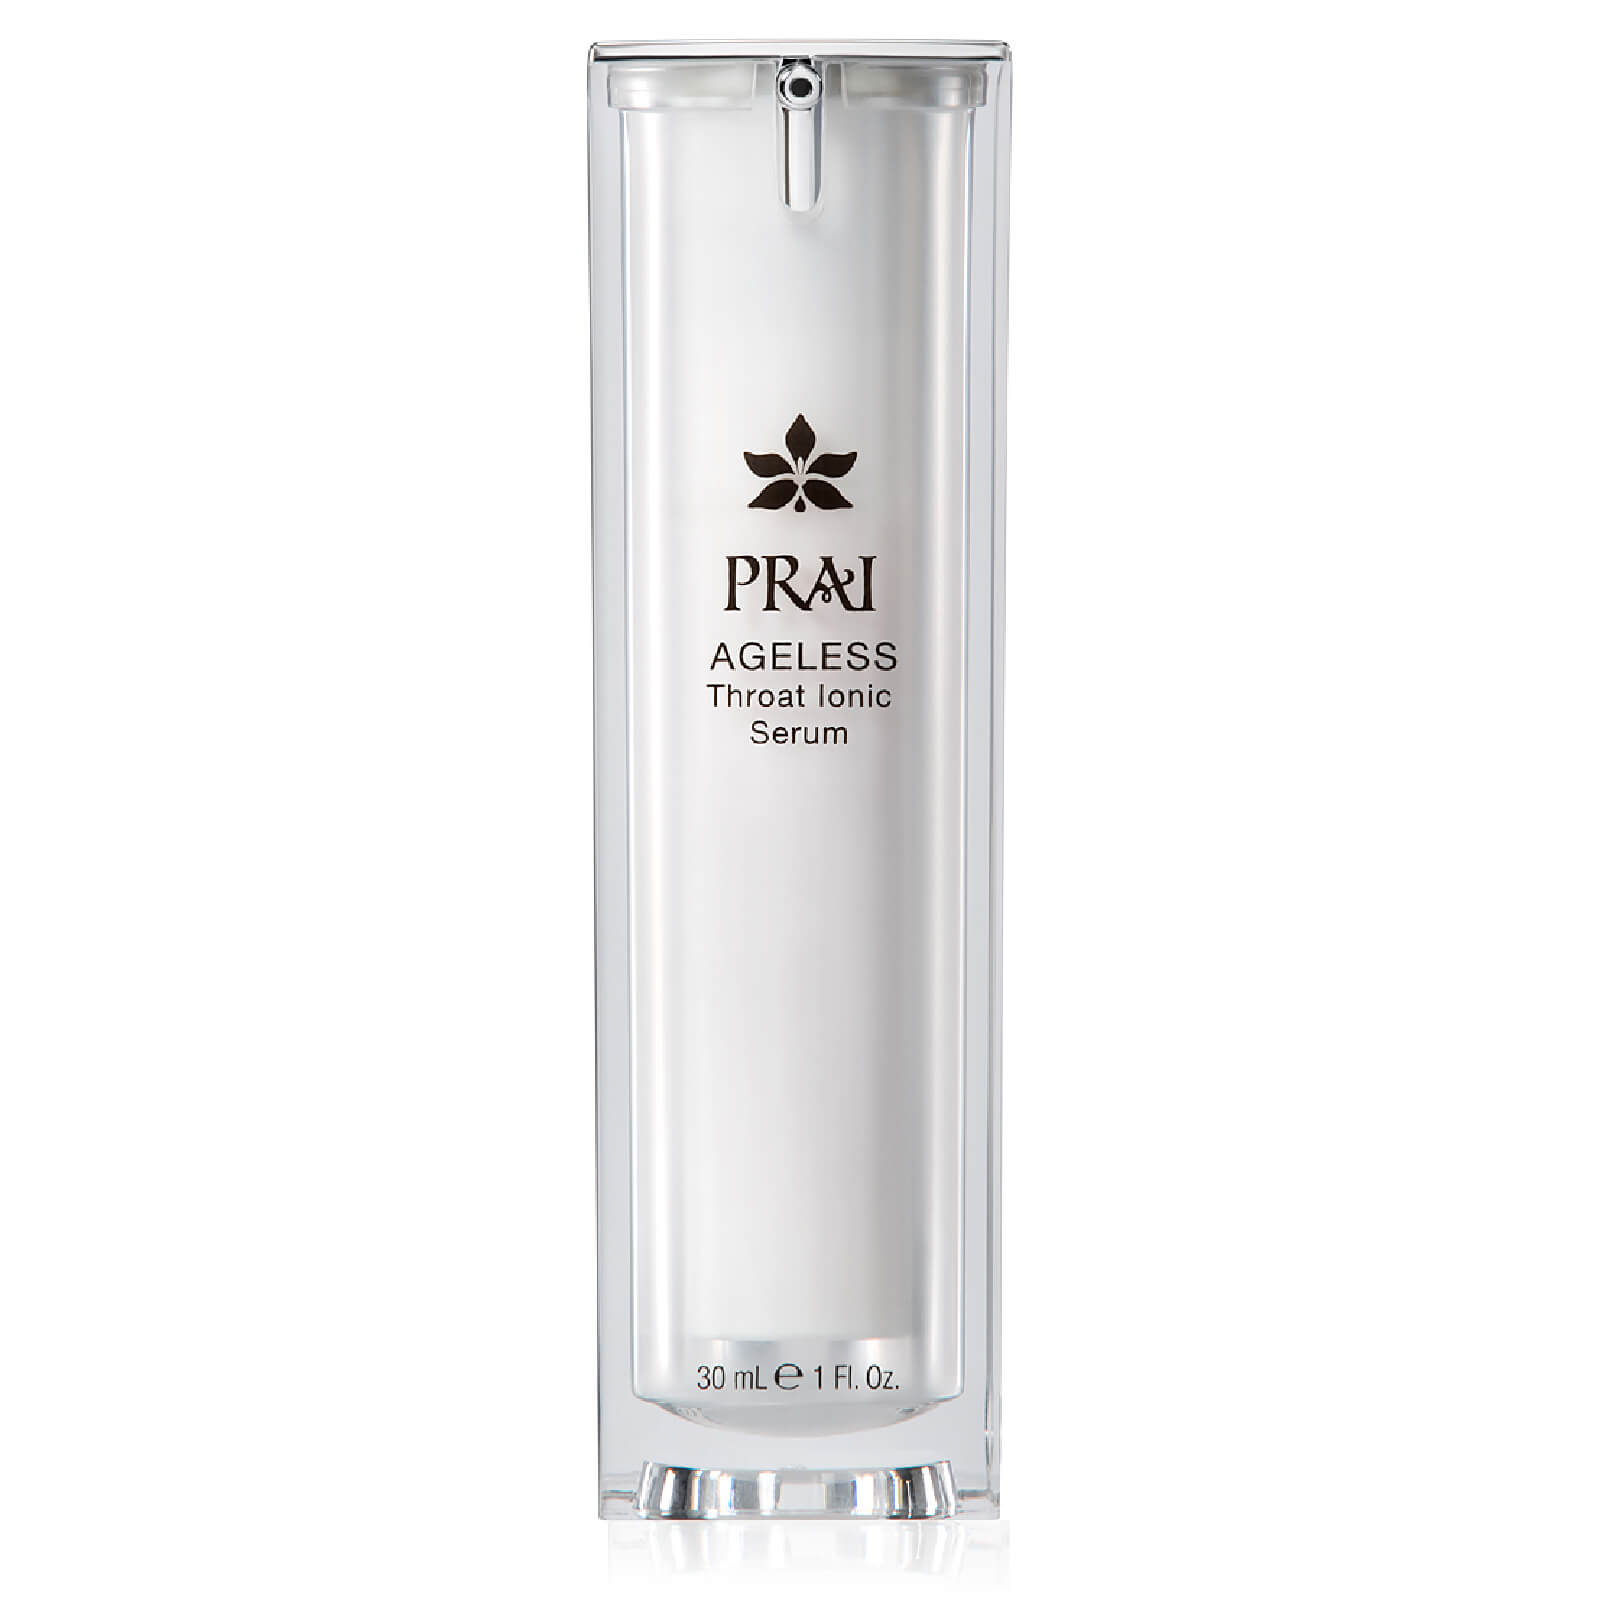 PRAI AGELESS Ionic siero collo (30 ml)